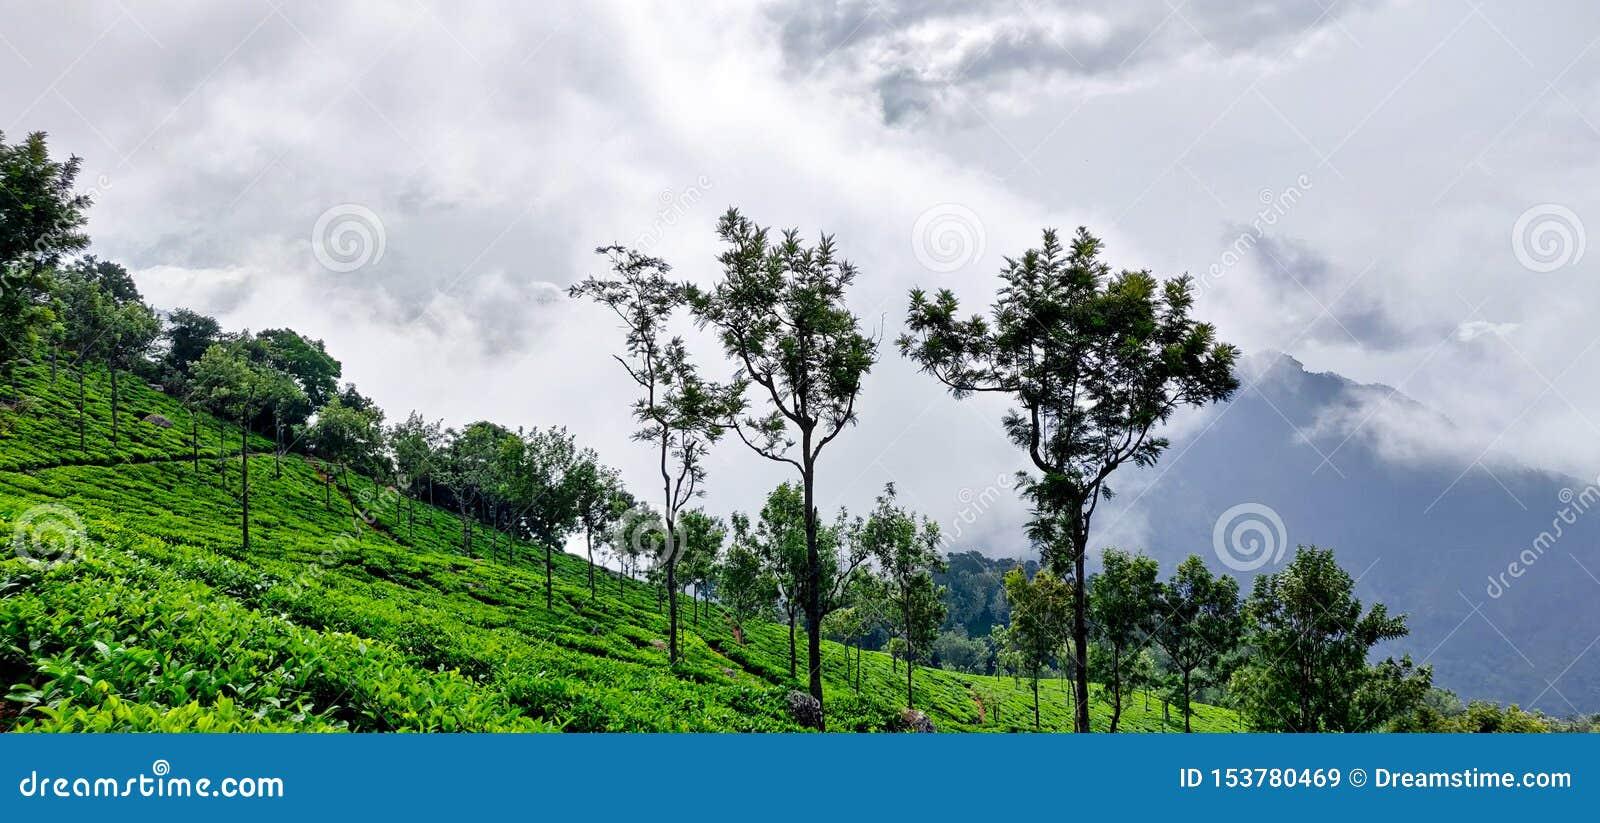 Tea garden on the hills of Coonoor under the rainy clouds of monsoon